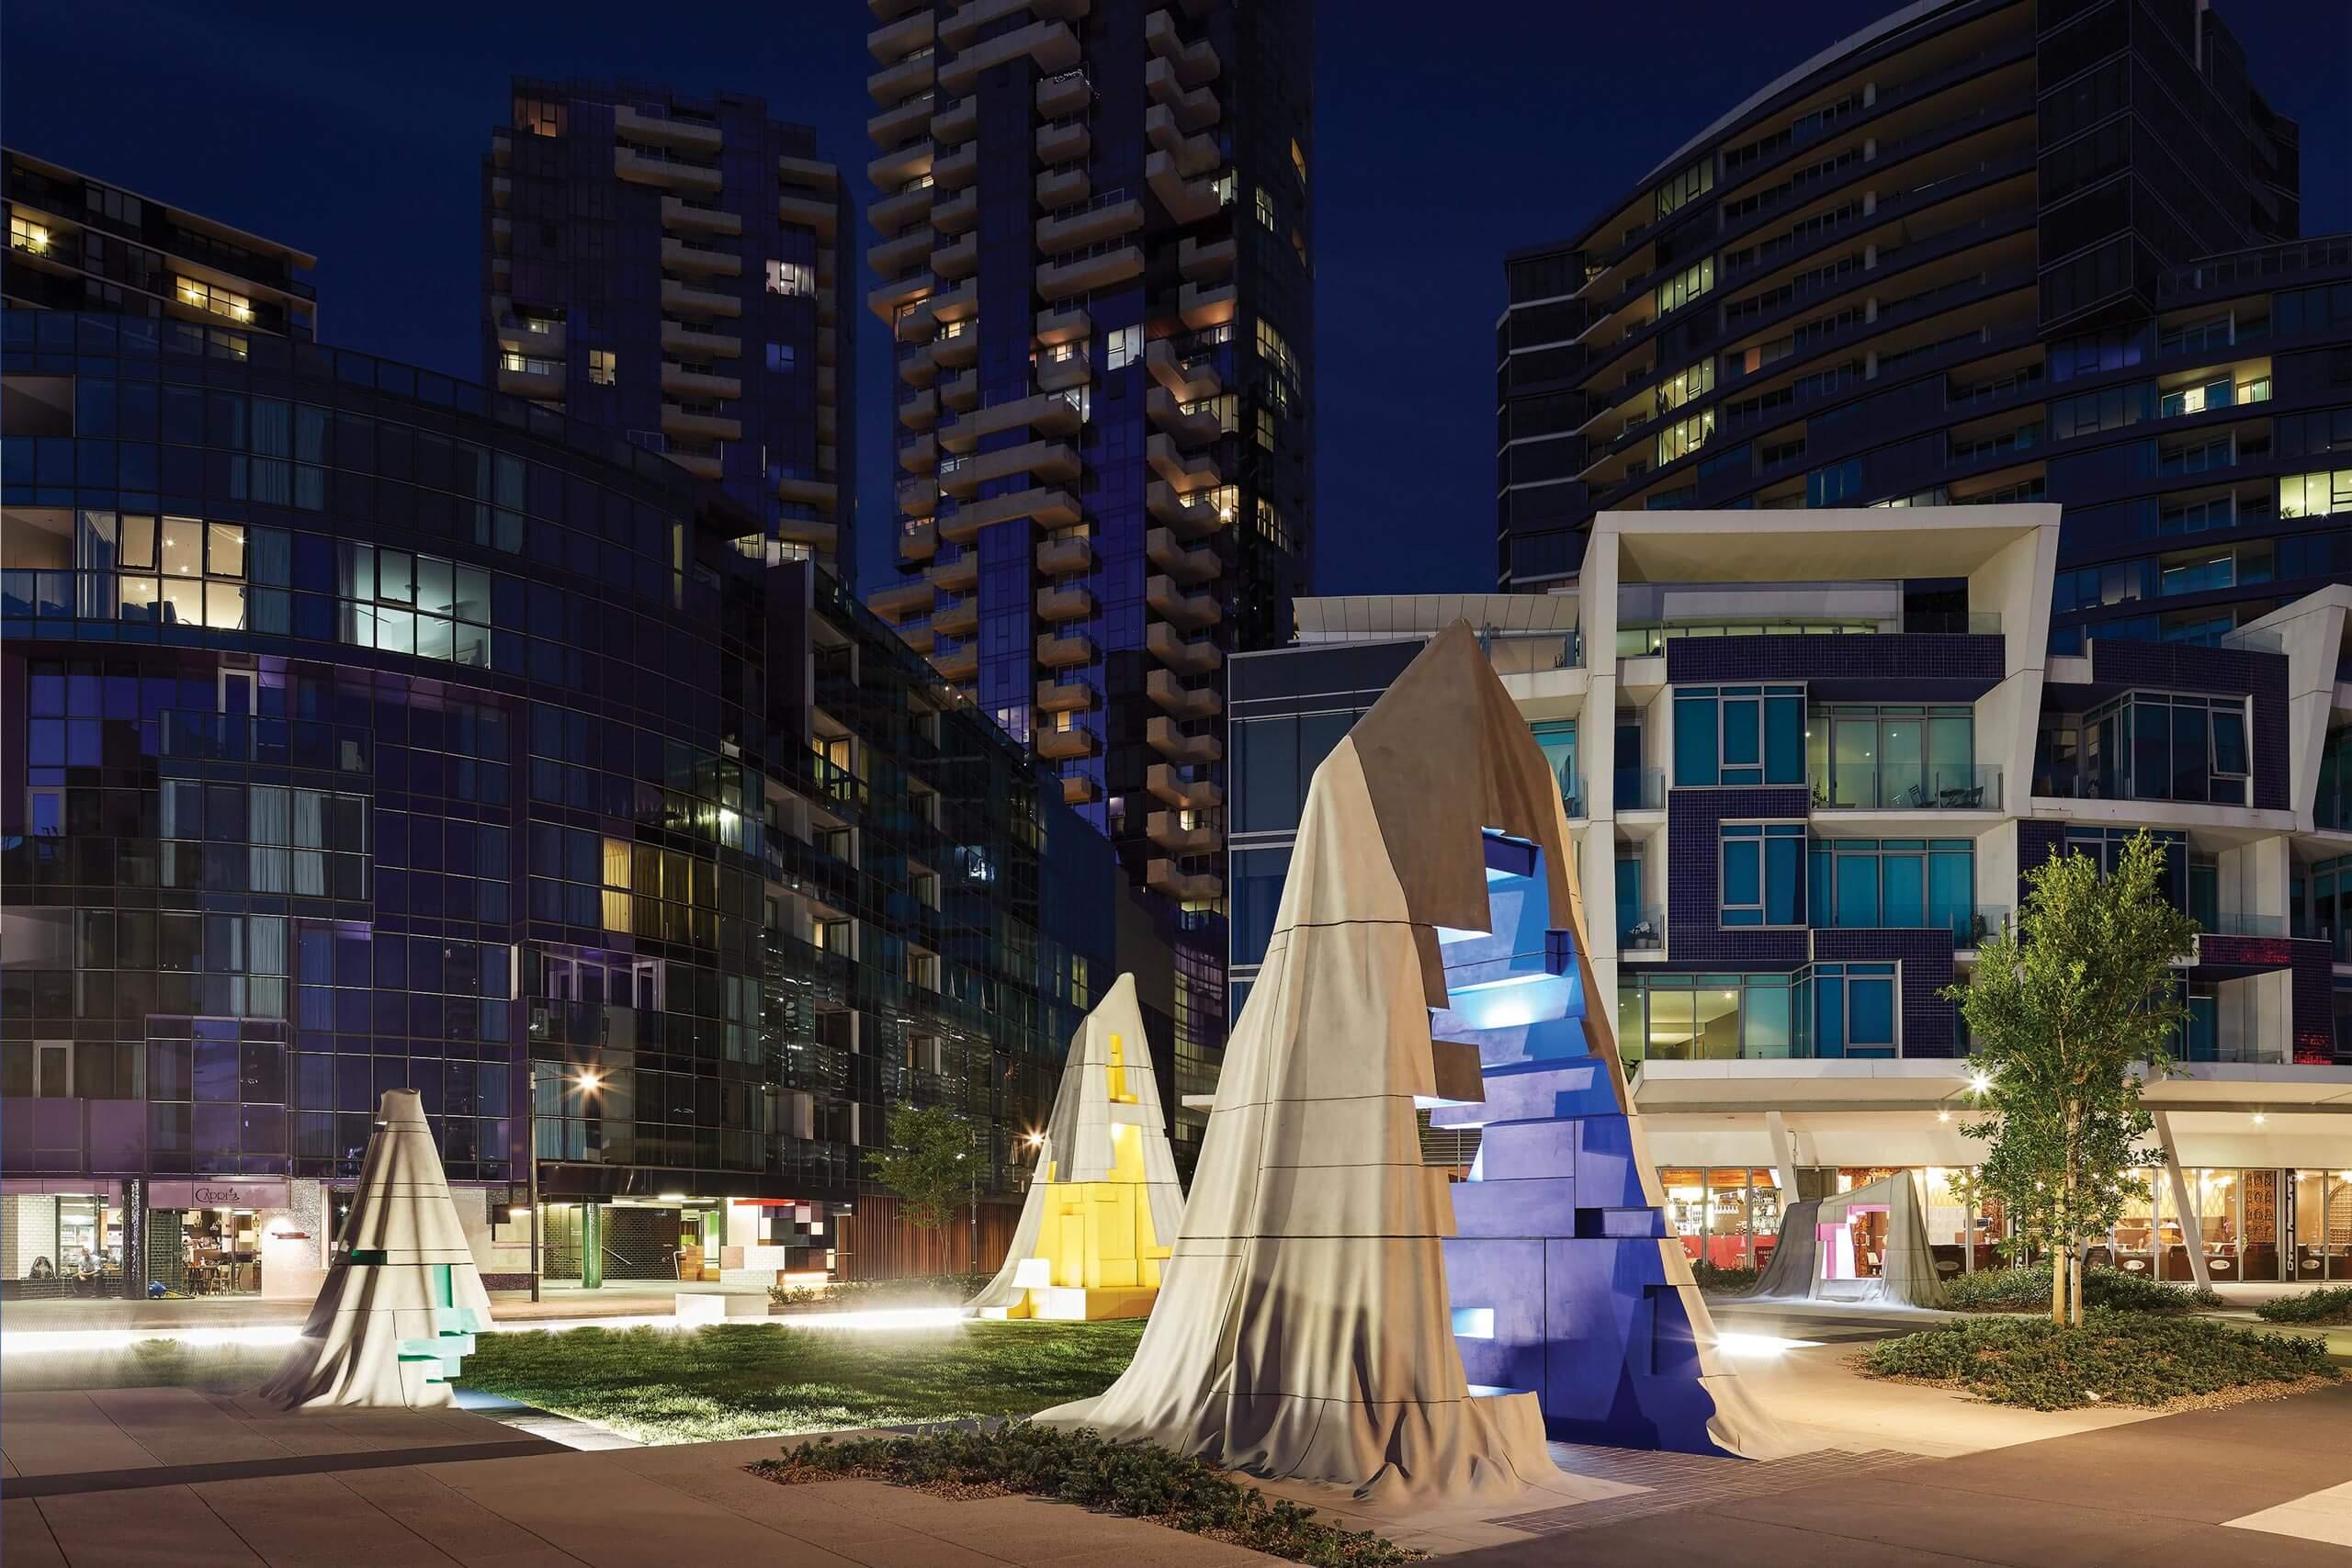 grc-environments-home-mounment-park-night